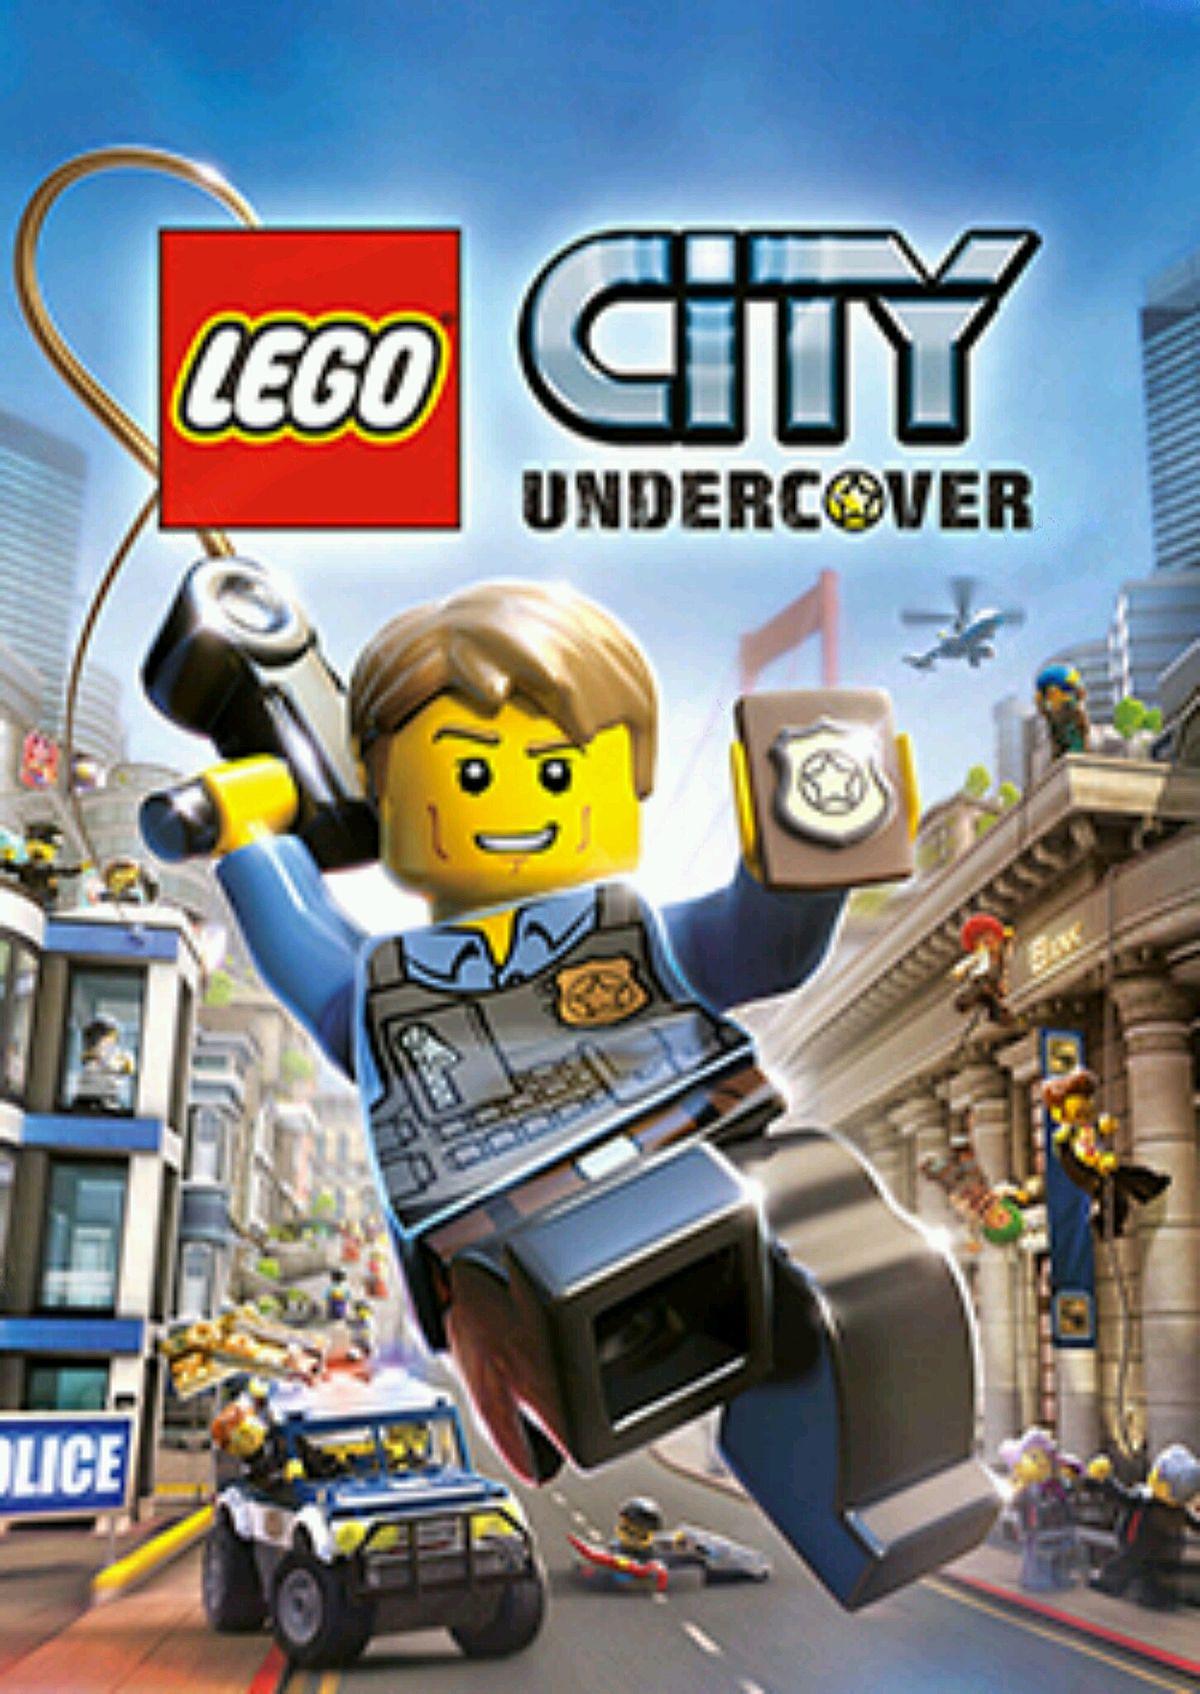 все цены на LEGO City Undercover [PC, Цифровая версия] (Цифровая версия)